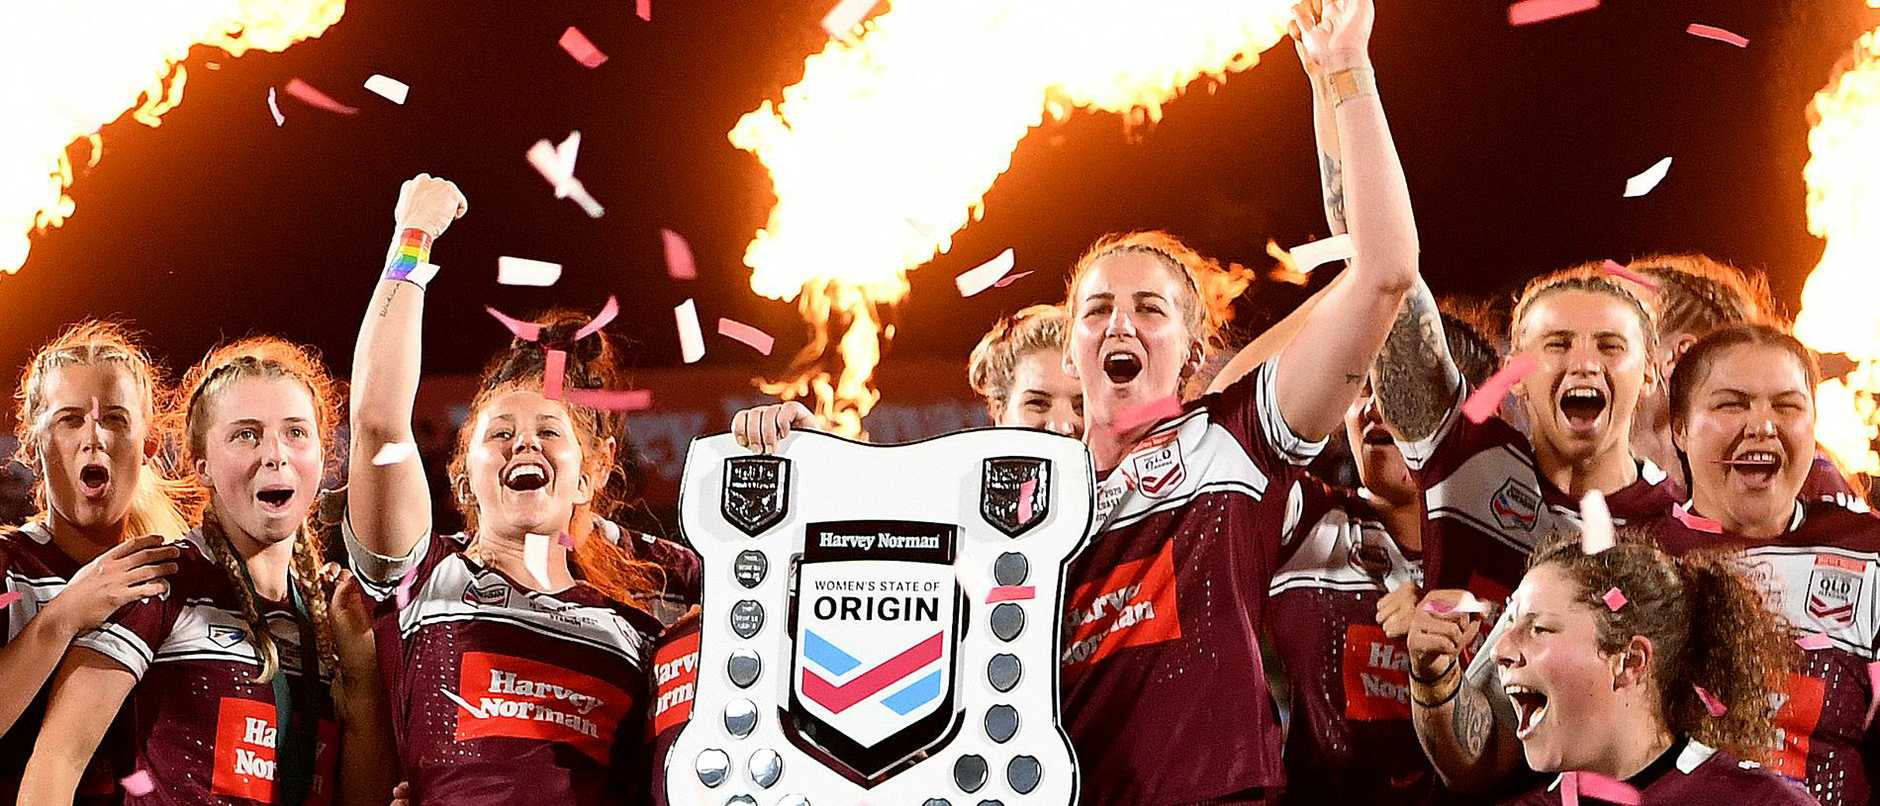 Women's State of Origin - QLD v NSW